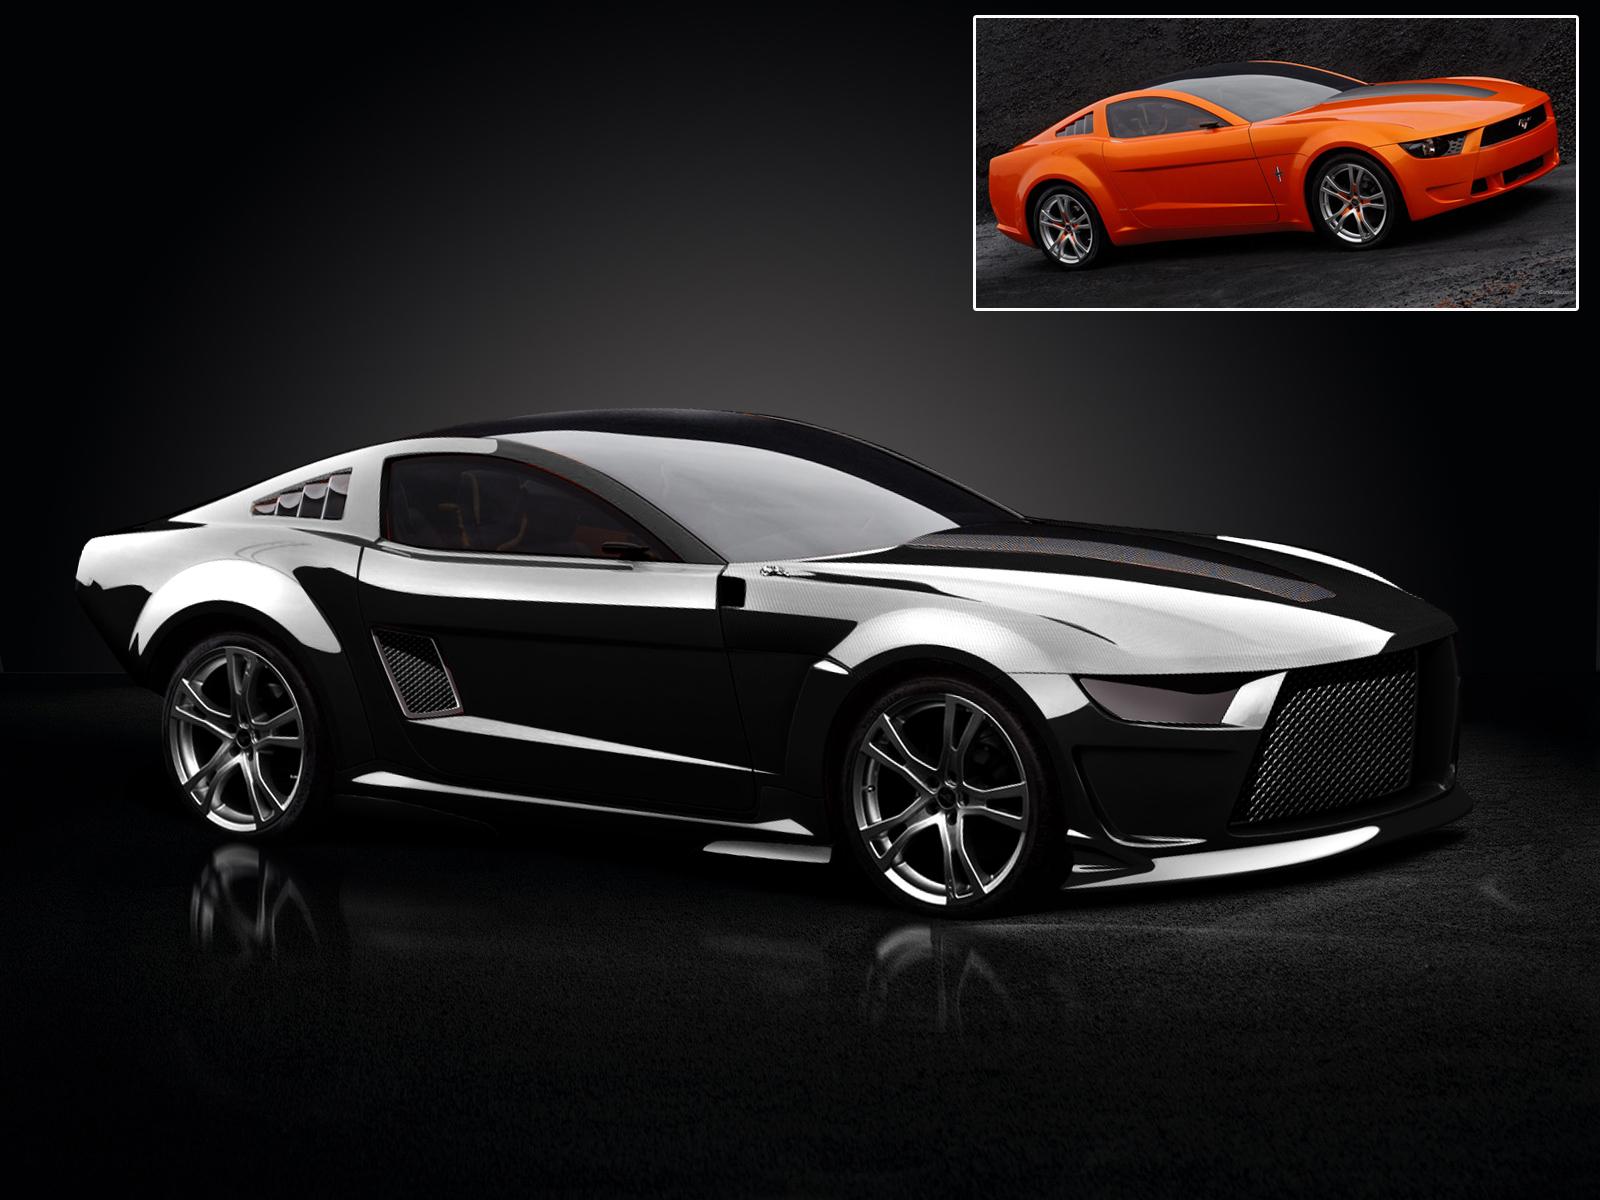 http://2.bp.blogspot.com/-nJ-CKleDGFw/TcMy0owvCmI/AAAAAAAAABY/4nUvZZuw5fk/s1600/Ford_Mustang-GiugiaroBlackHT.jpg